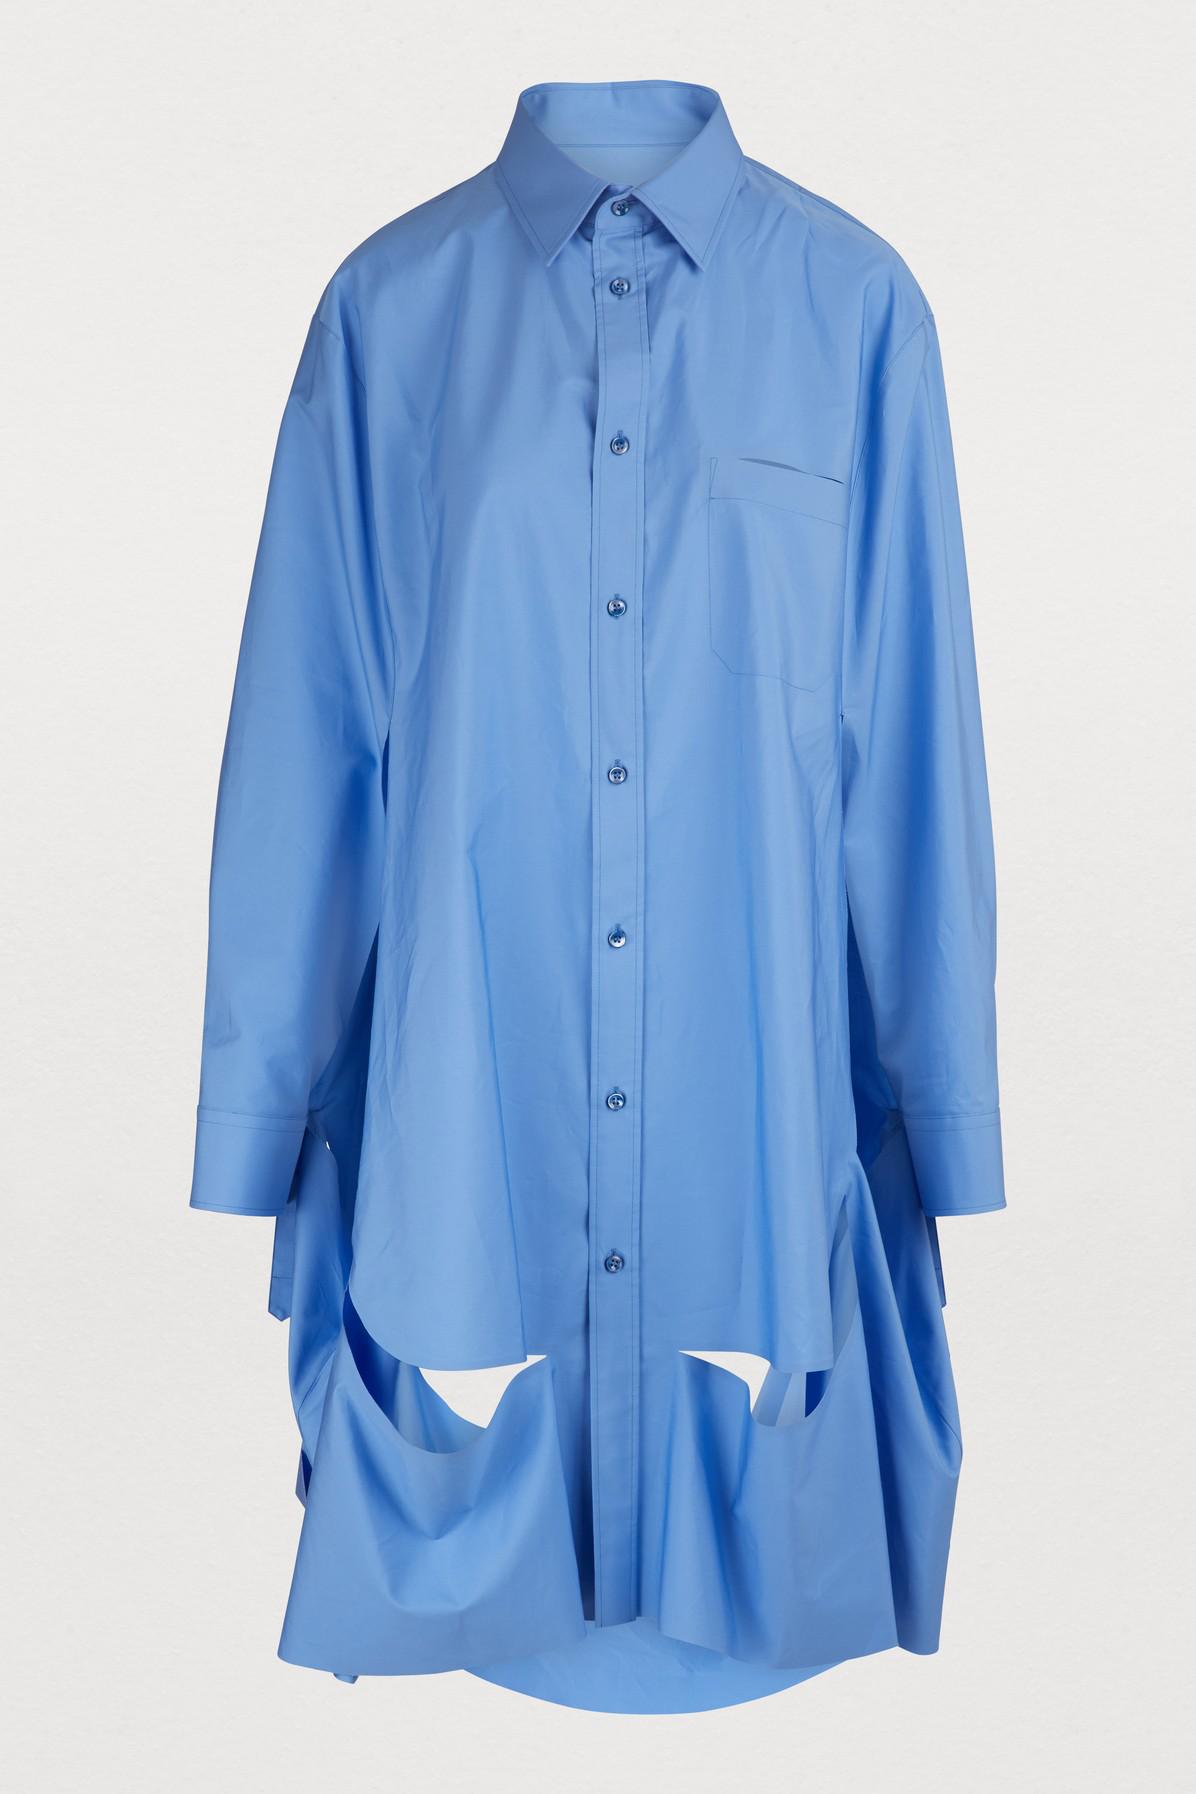 7c1d389e Maison Margiela Cotton Poplin Shirt In Sky Blue   ModeSens